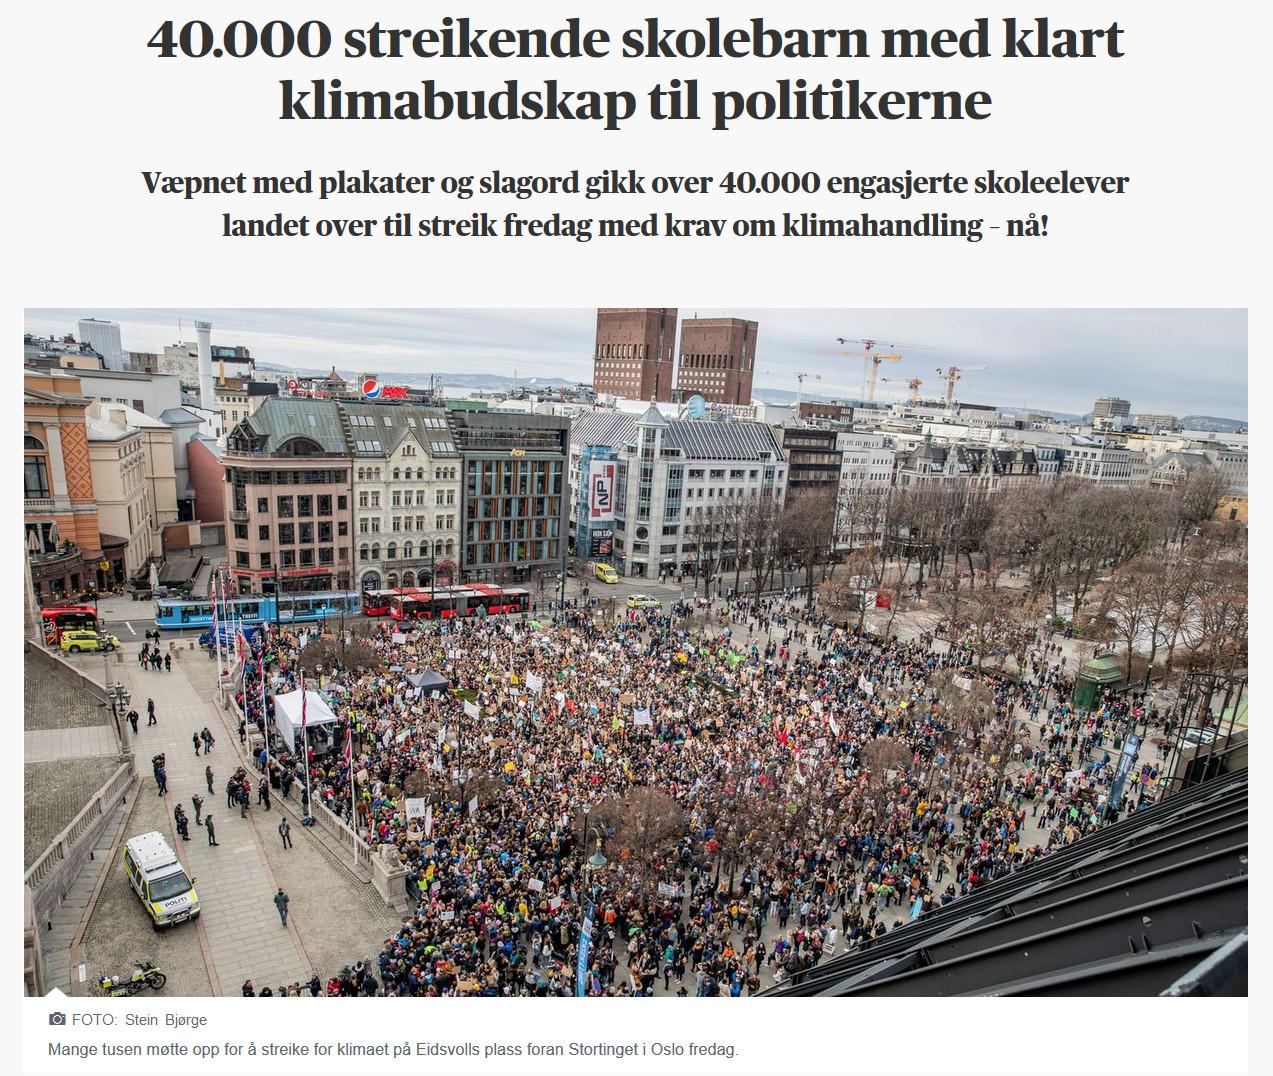 Streikende skolebarn i Norge (Oslo).jpg